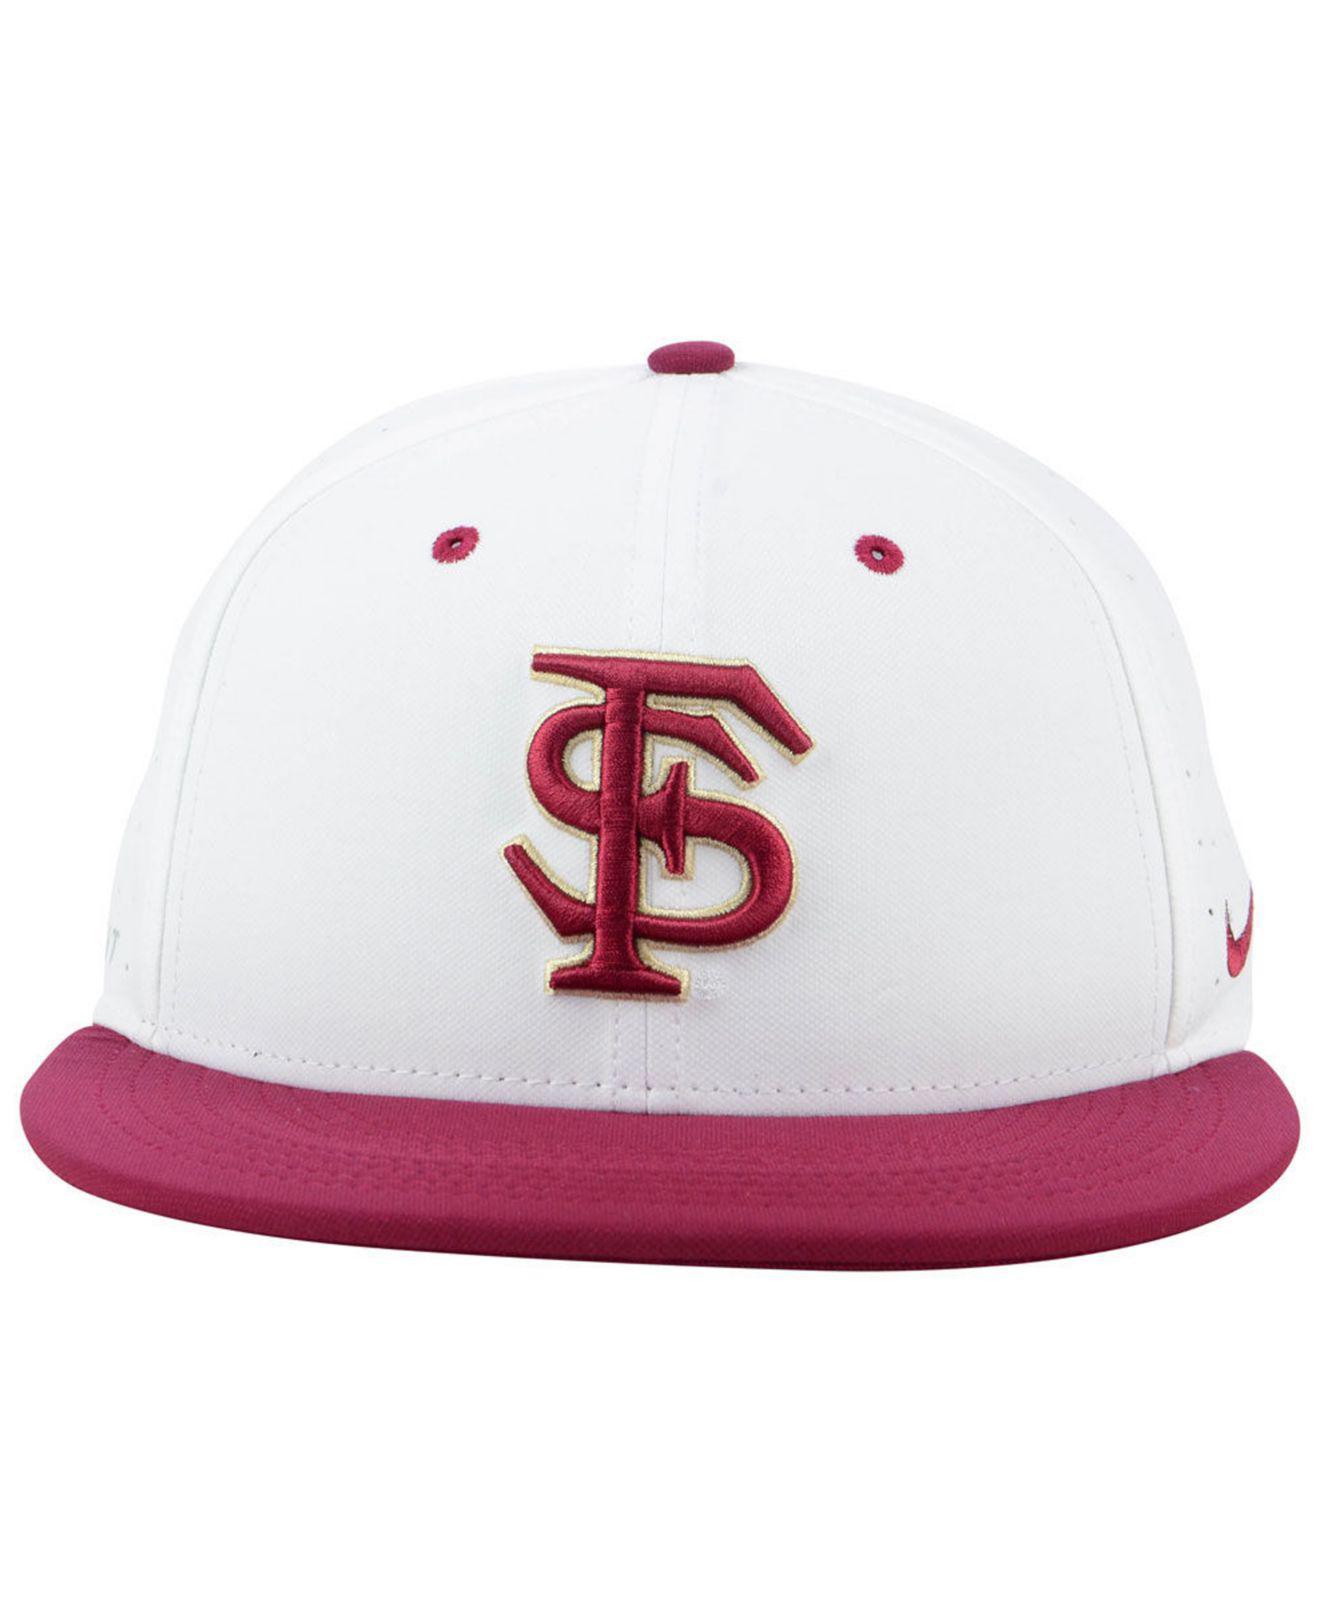 0fb2b5645f393 ... uk lyst nike florida state seminoles aerobill true fitted baseball cap  in white for men 7cbbd